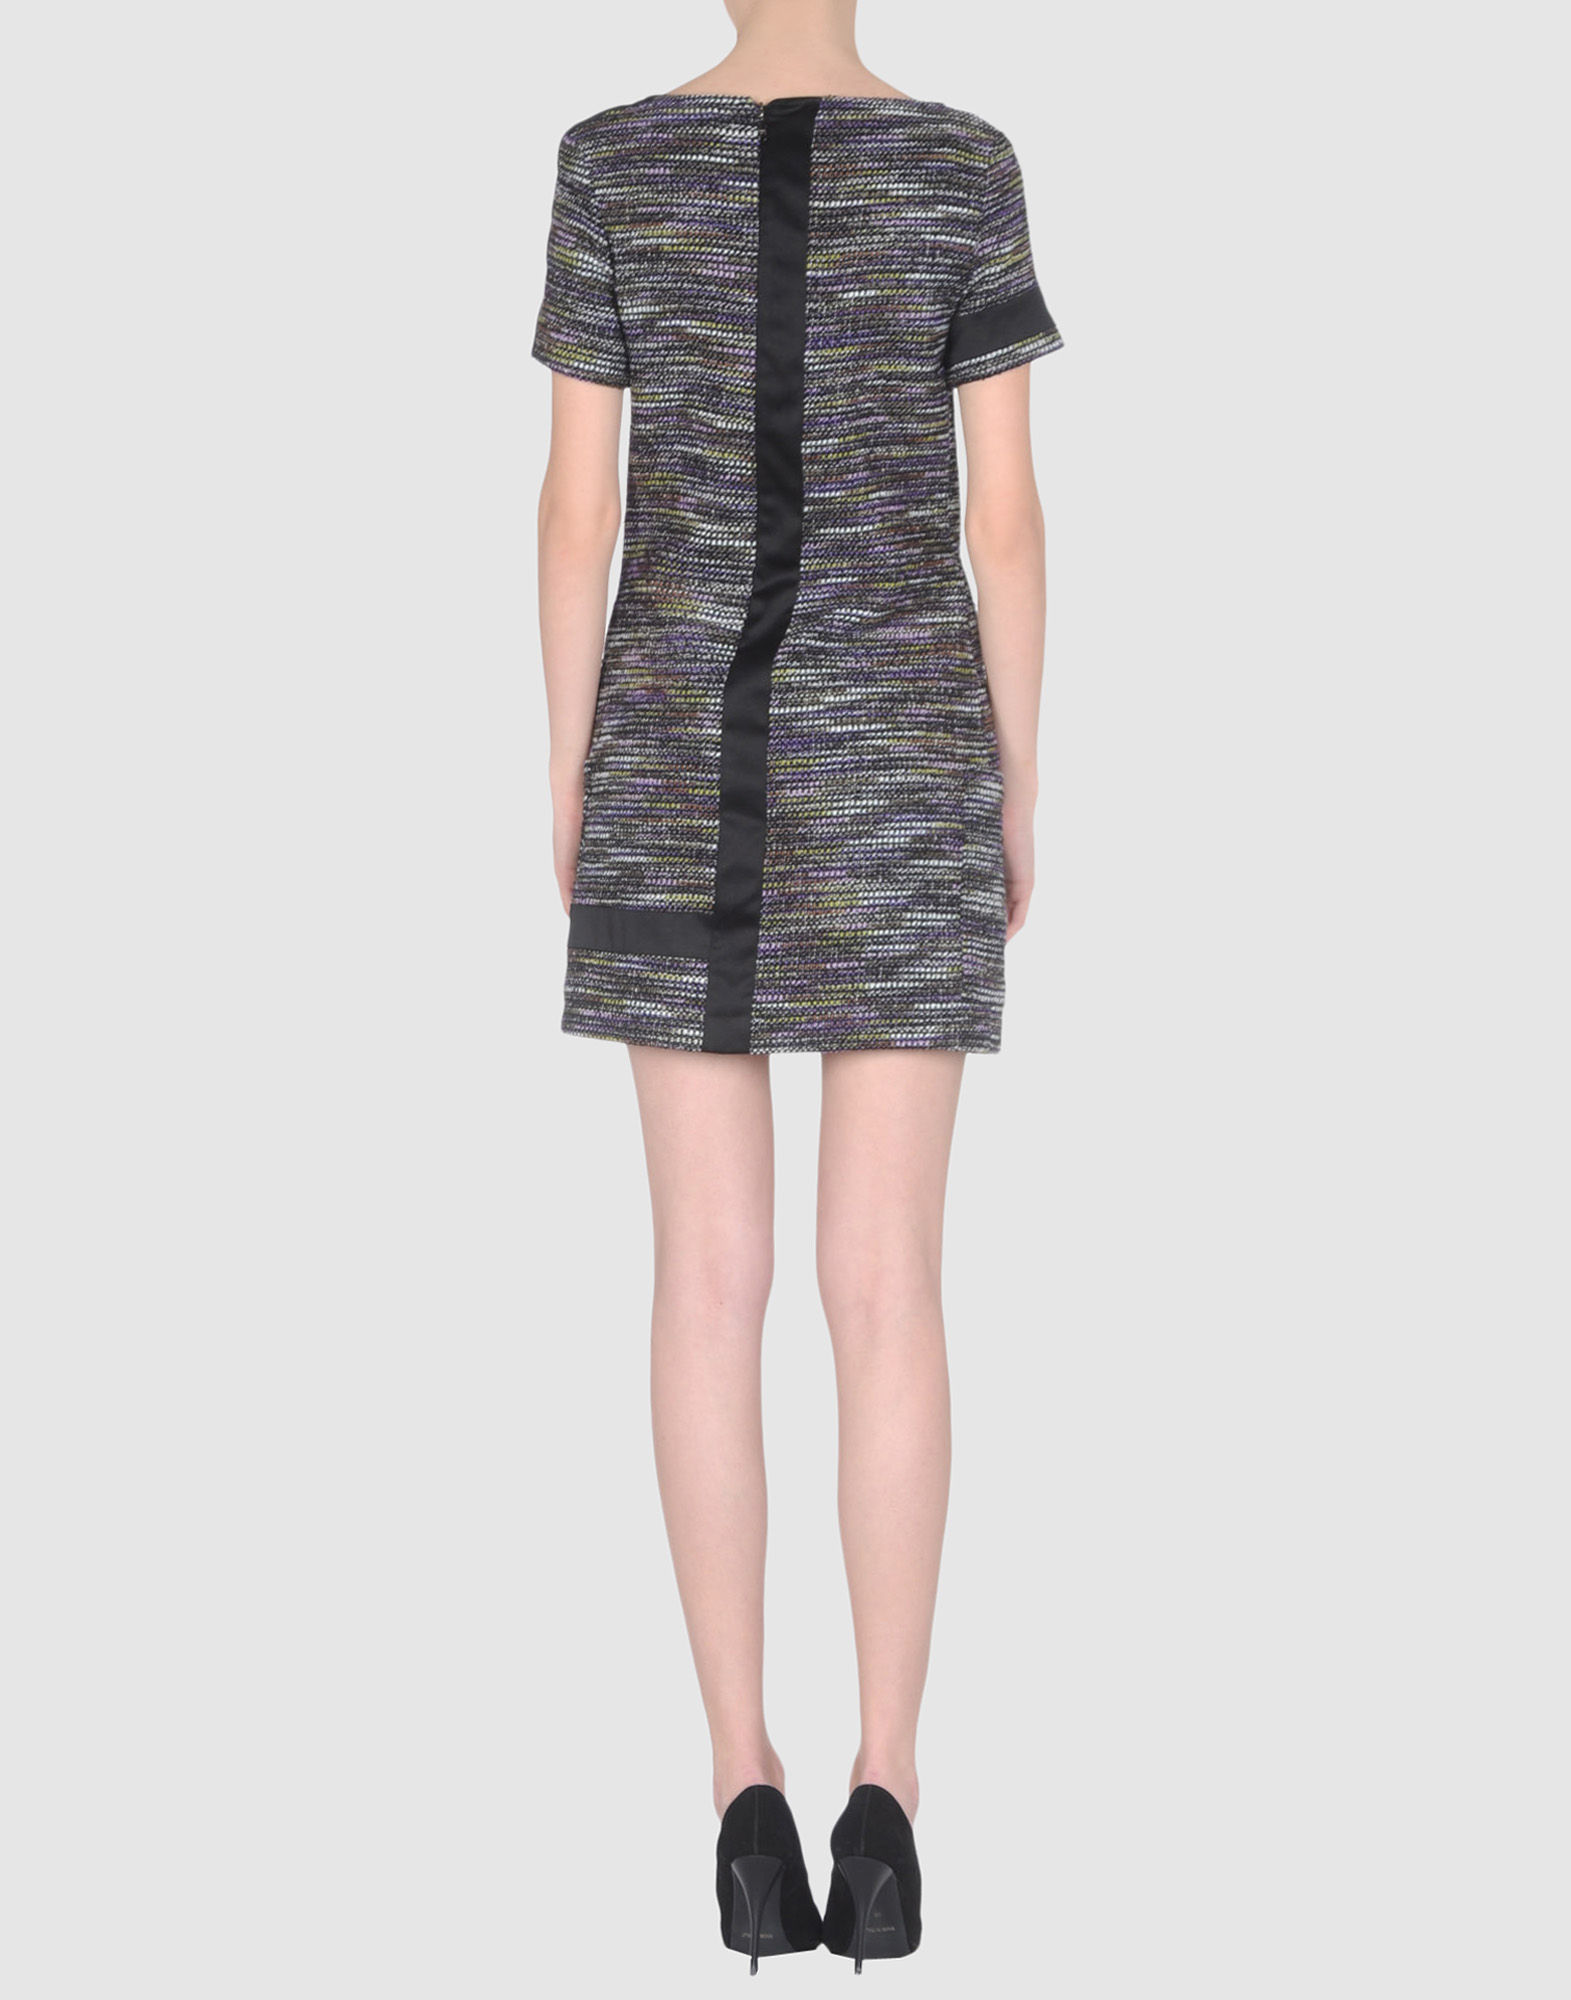 34212914VX 14 r - Casual Φορεματα Versace 2011 2012 Κωδ.02